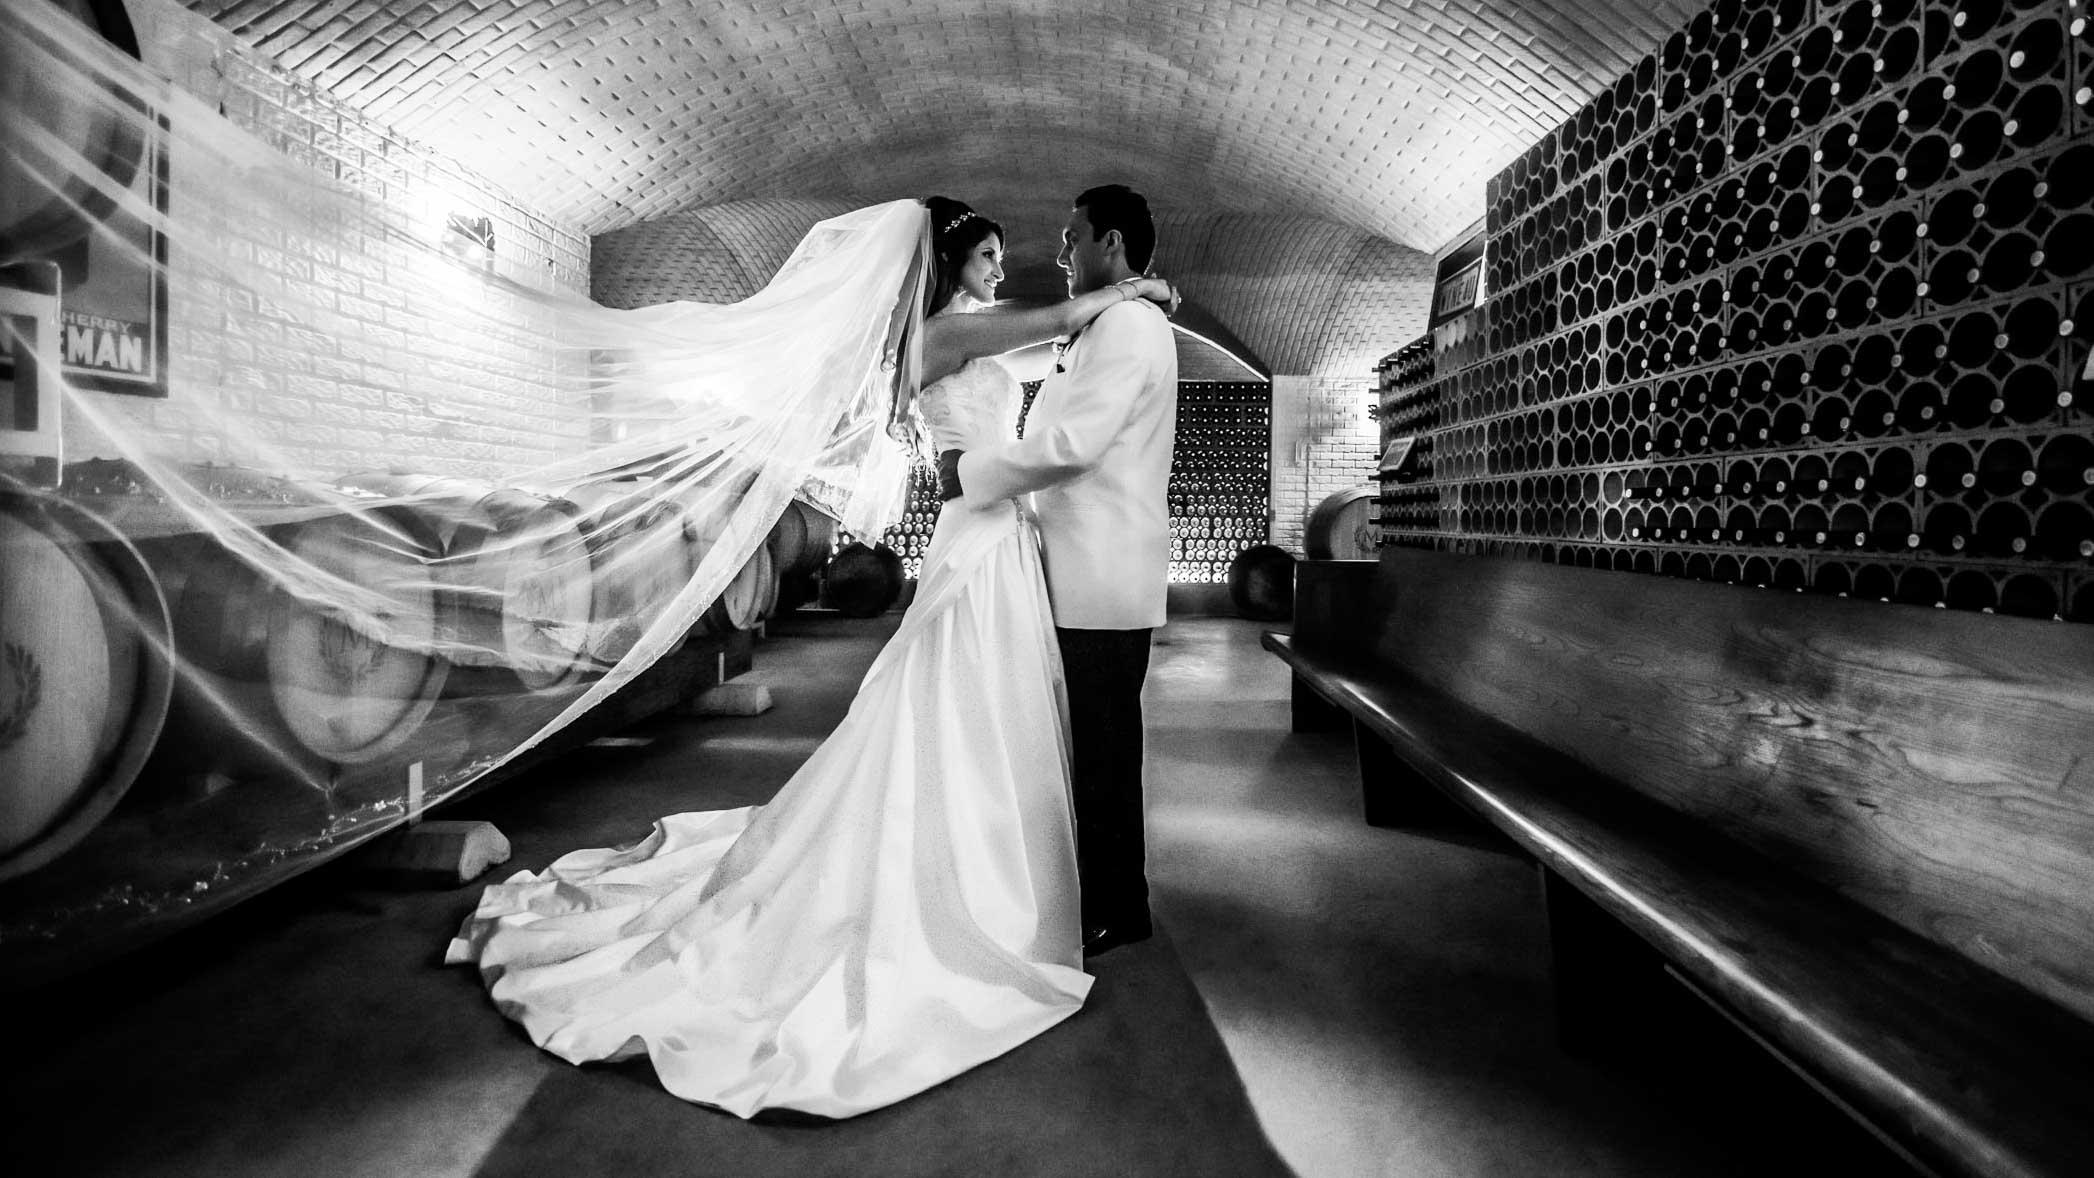 dc+metro+wedding+photographer+vadym+guliuk+photography+wedding+bride+and+groom-2043.jpg